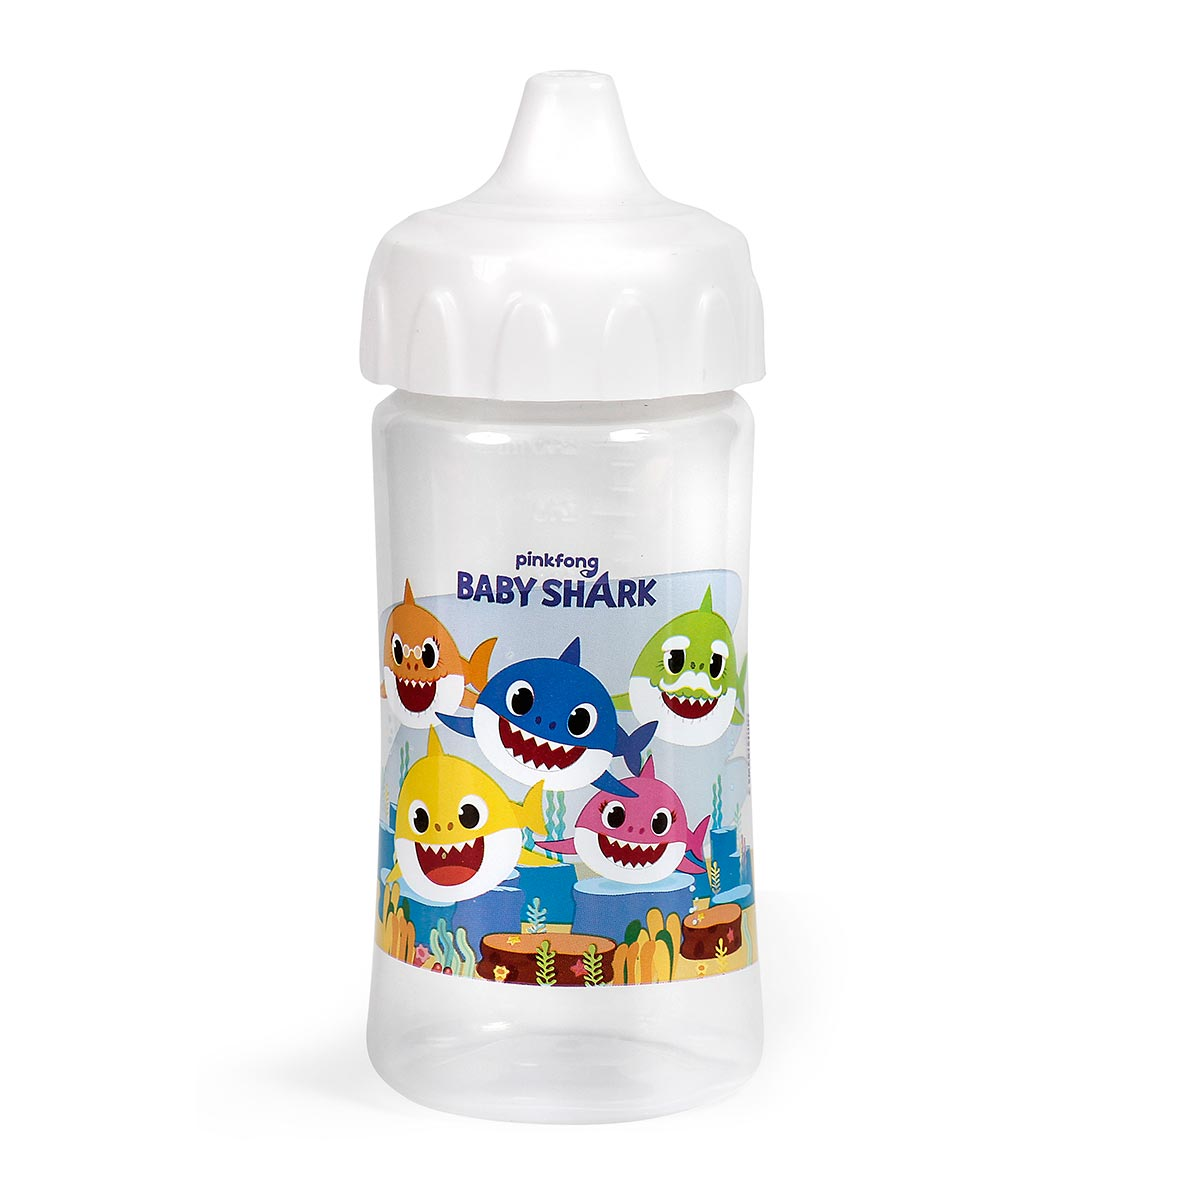 Copo C/ Redutor De Pingos + Tampa Baby Shark BabyGo Premium